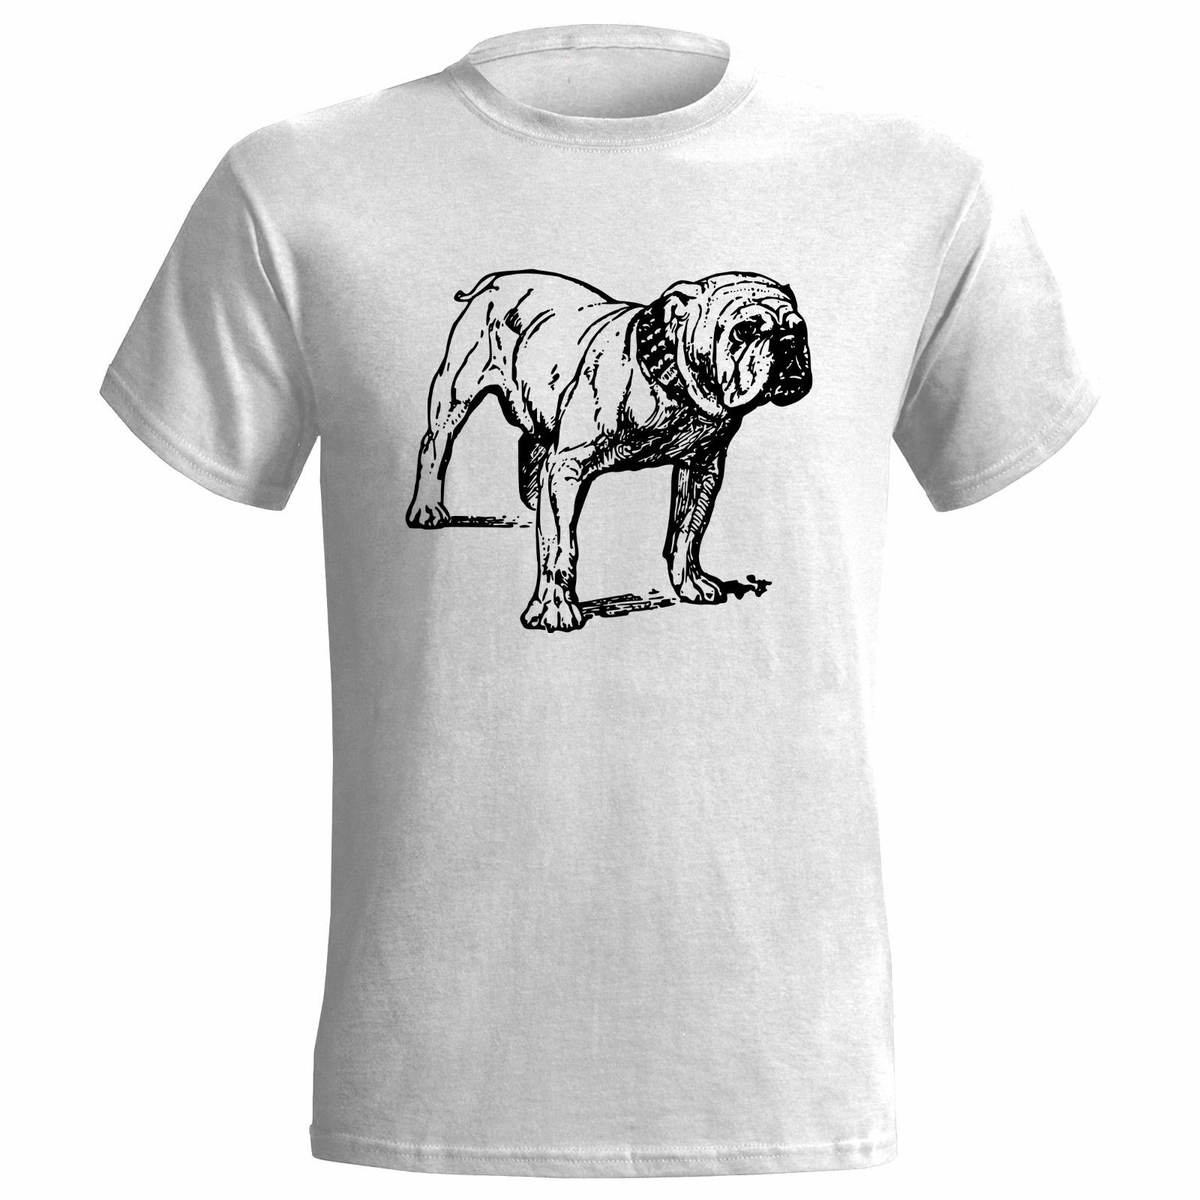 BULLDOG DOG SKETCH MENS T SHIRT PET CANINE PRESENT ART ANIMAL BRITISH